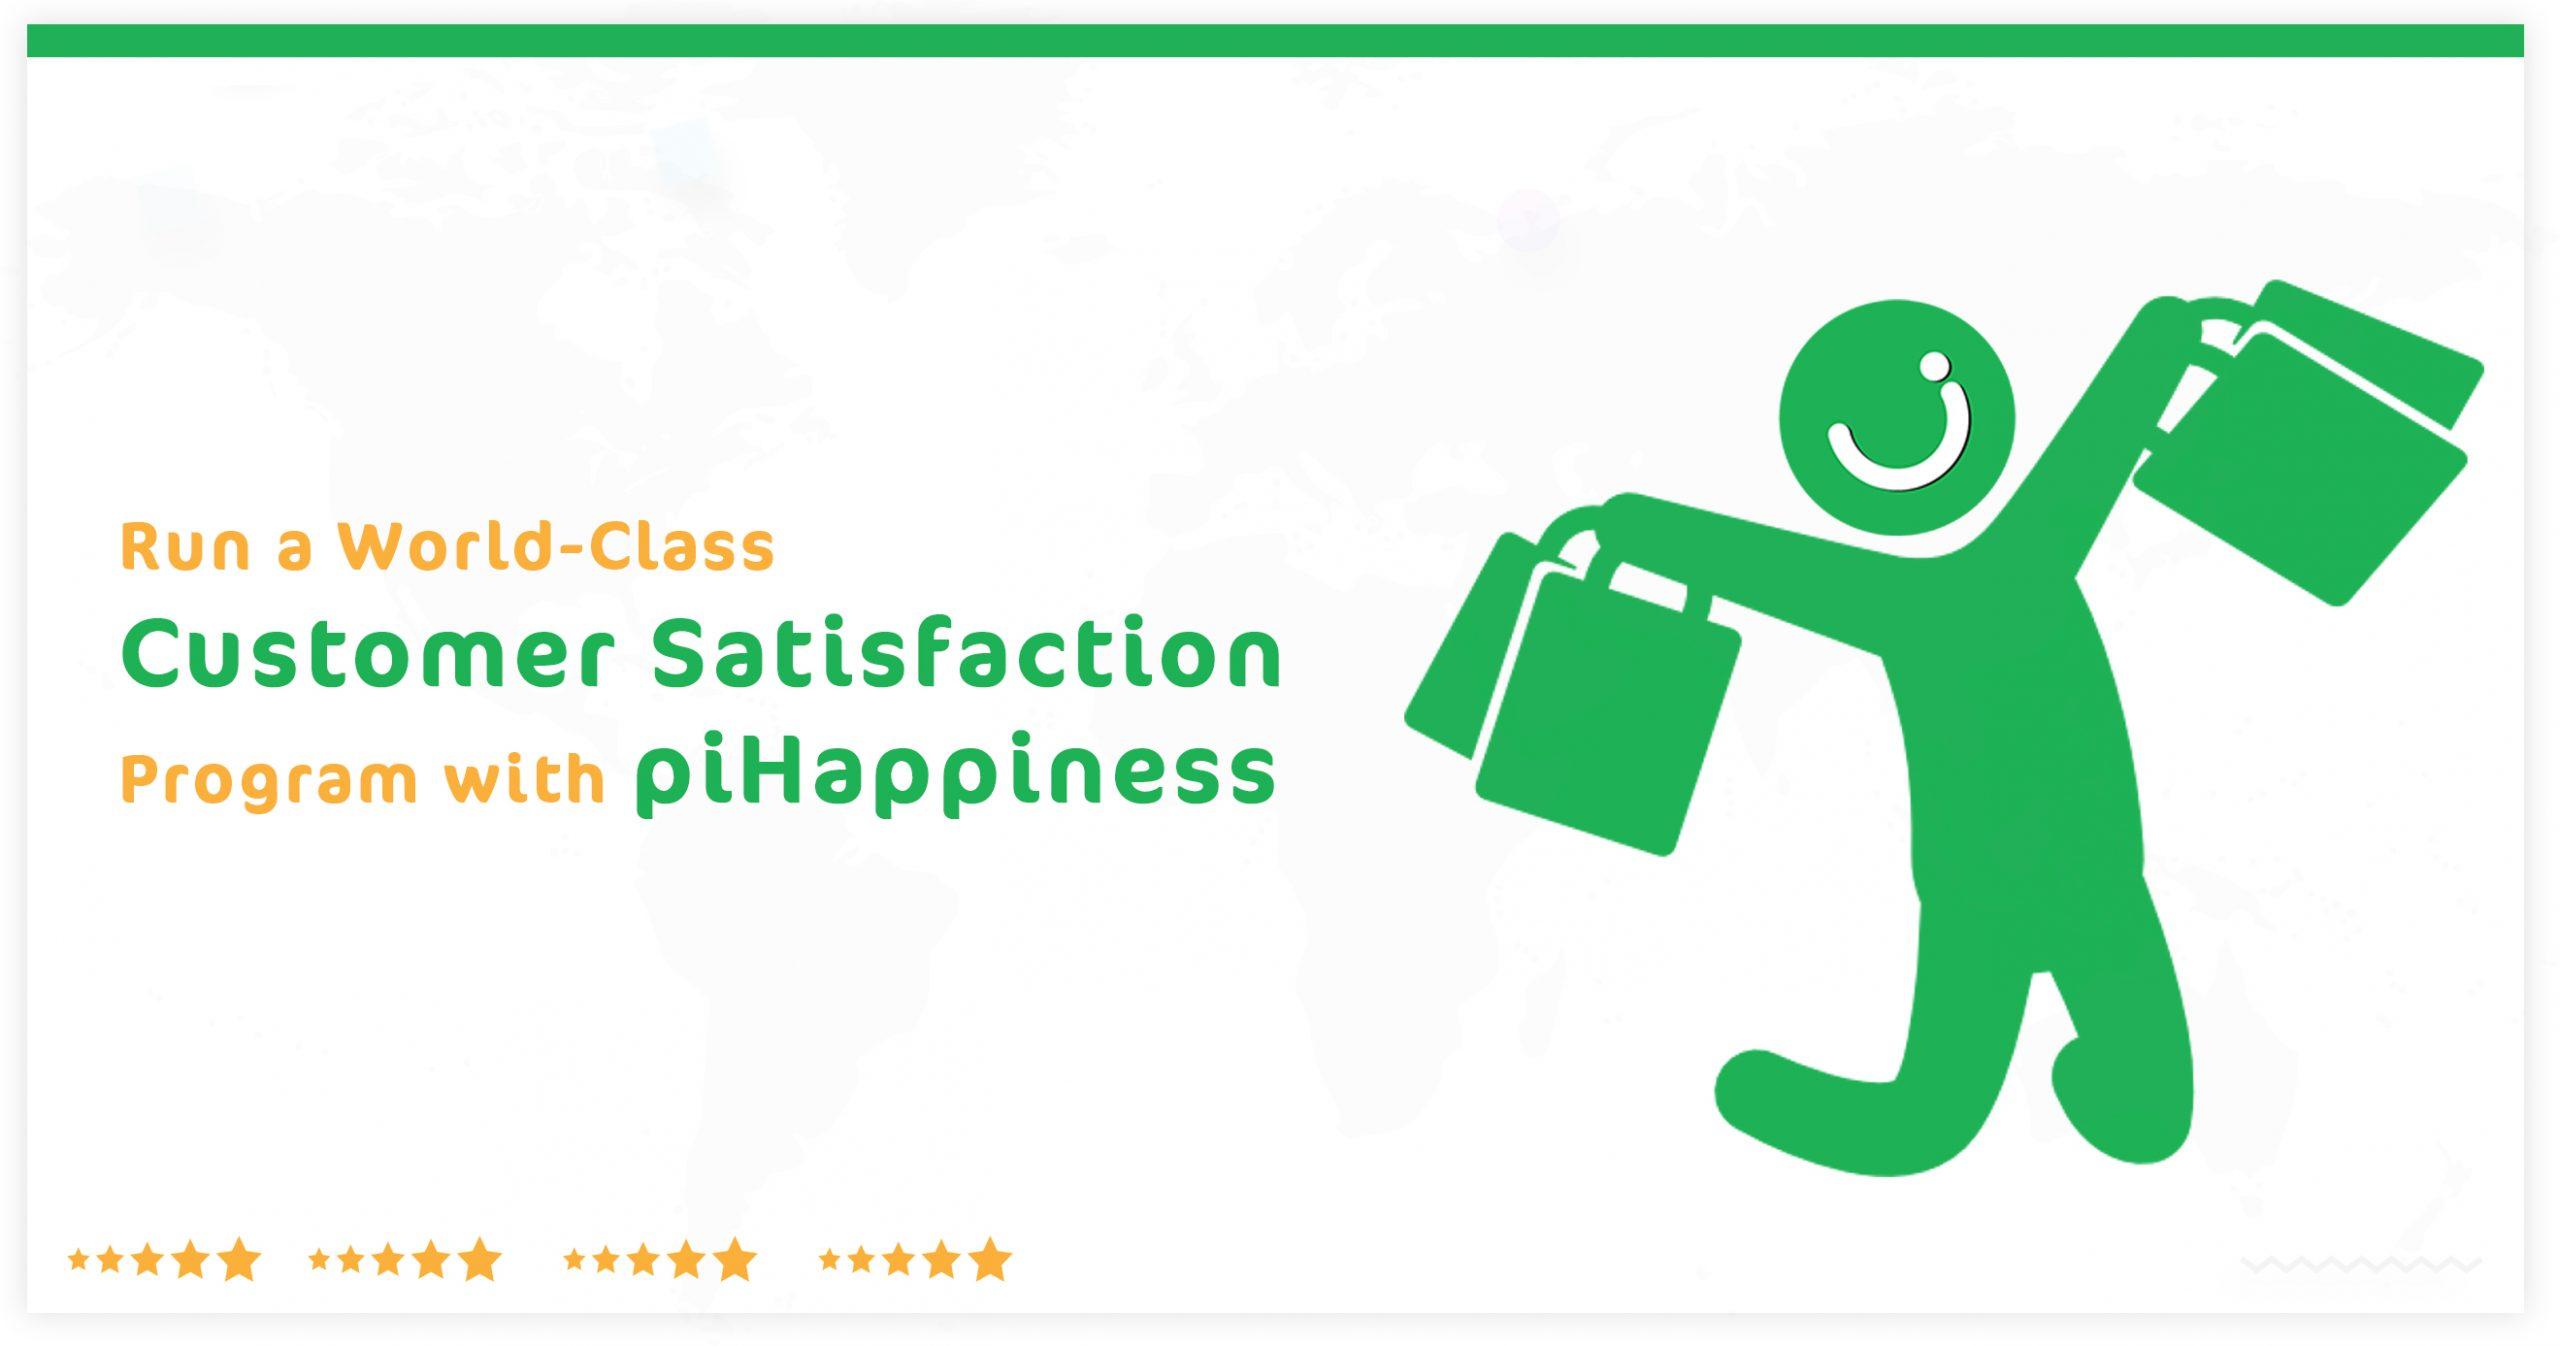 Run a World-Class Customer Satisfaction Program with piHappiness